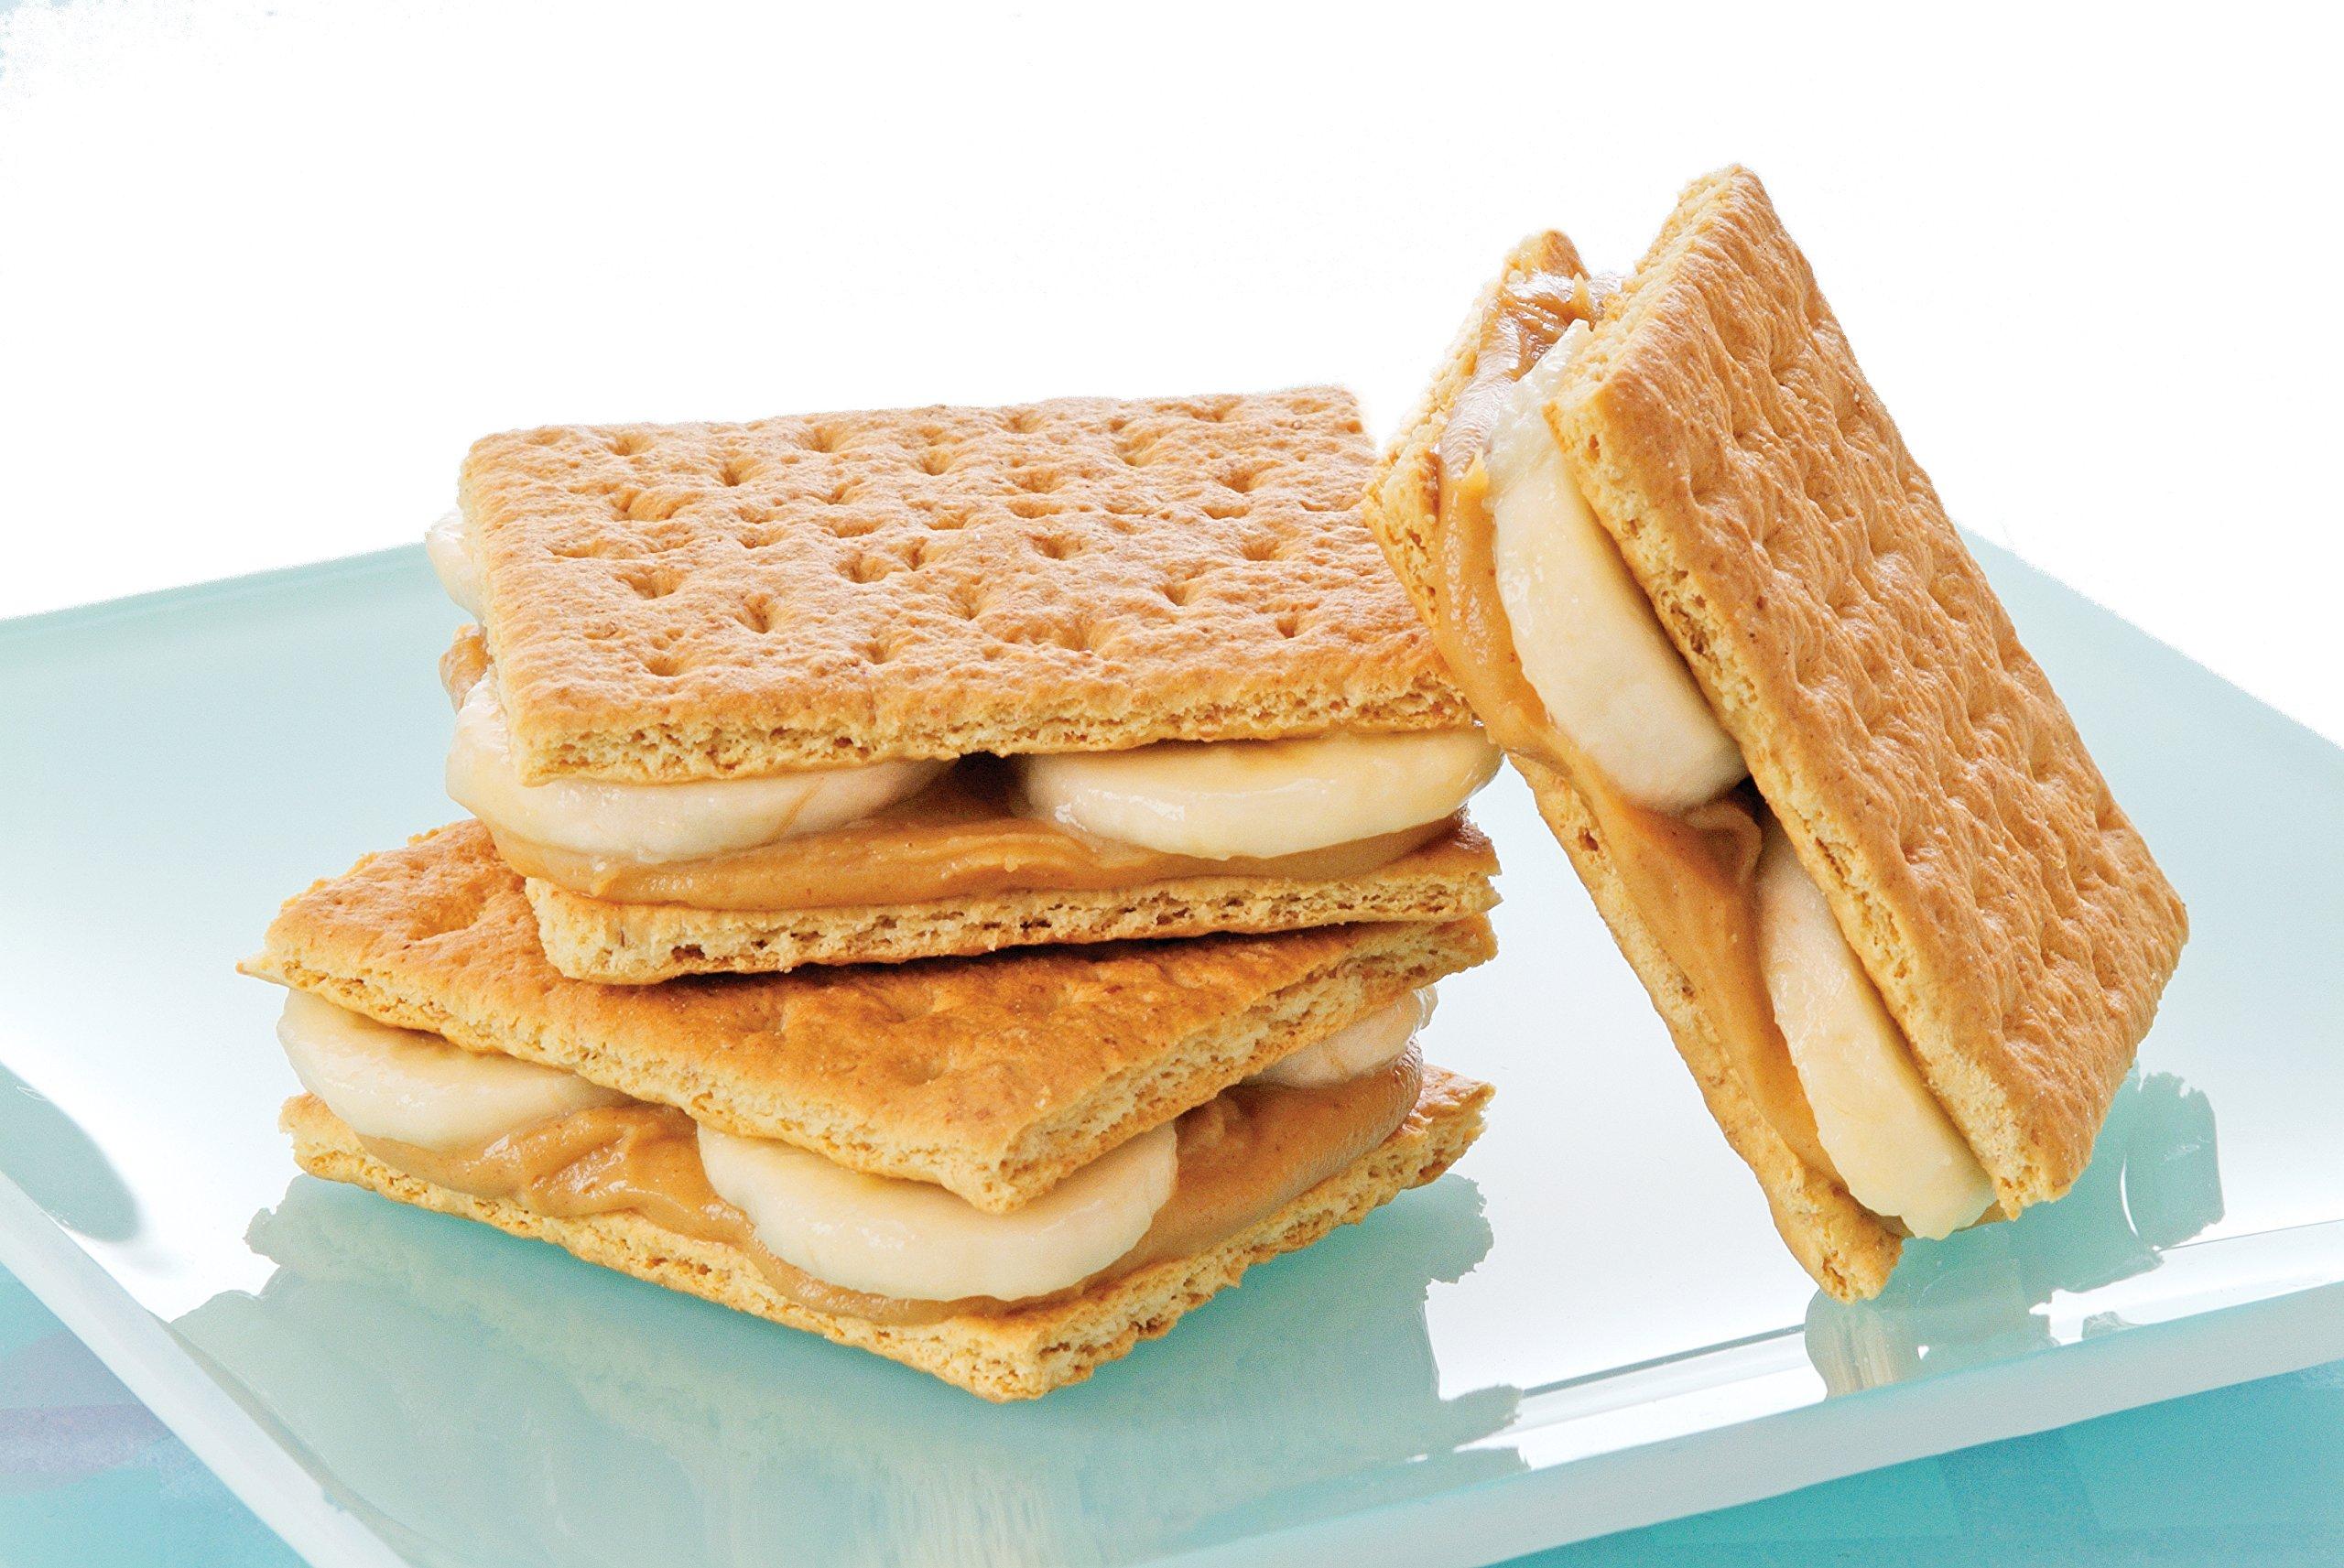 Honey Maid Honey Graham Crackers - Family Size, 25.6 Ounce (Pack of 6) by Honey Maid (Image #7)